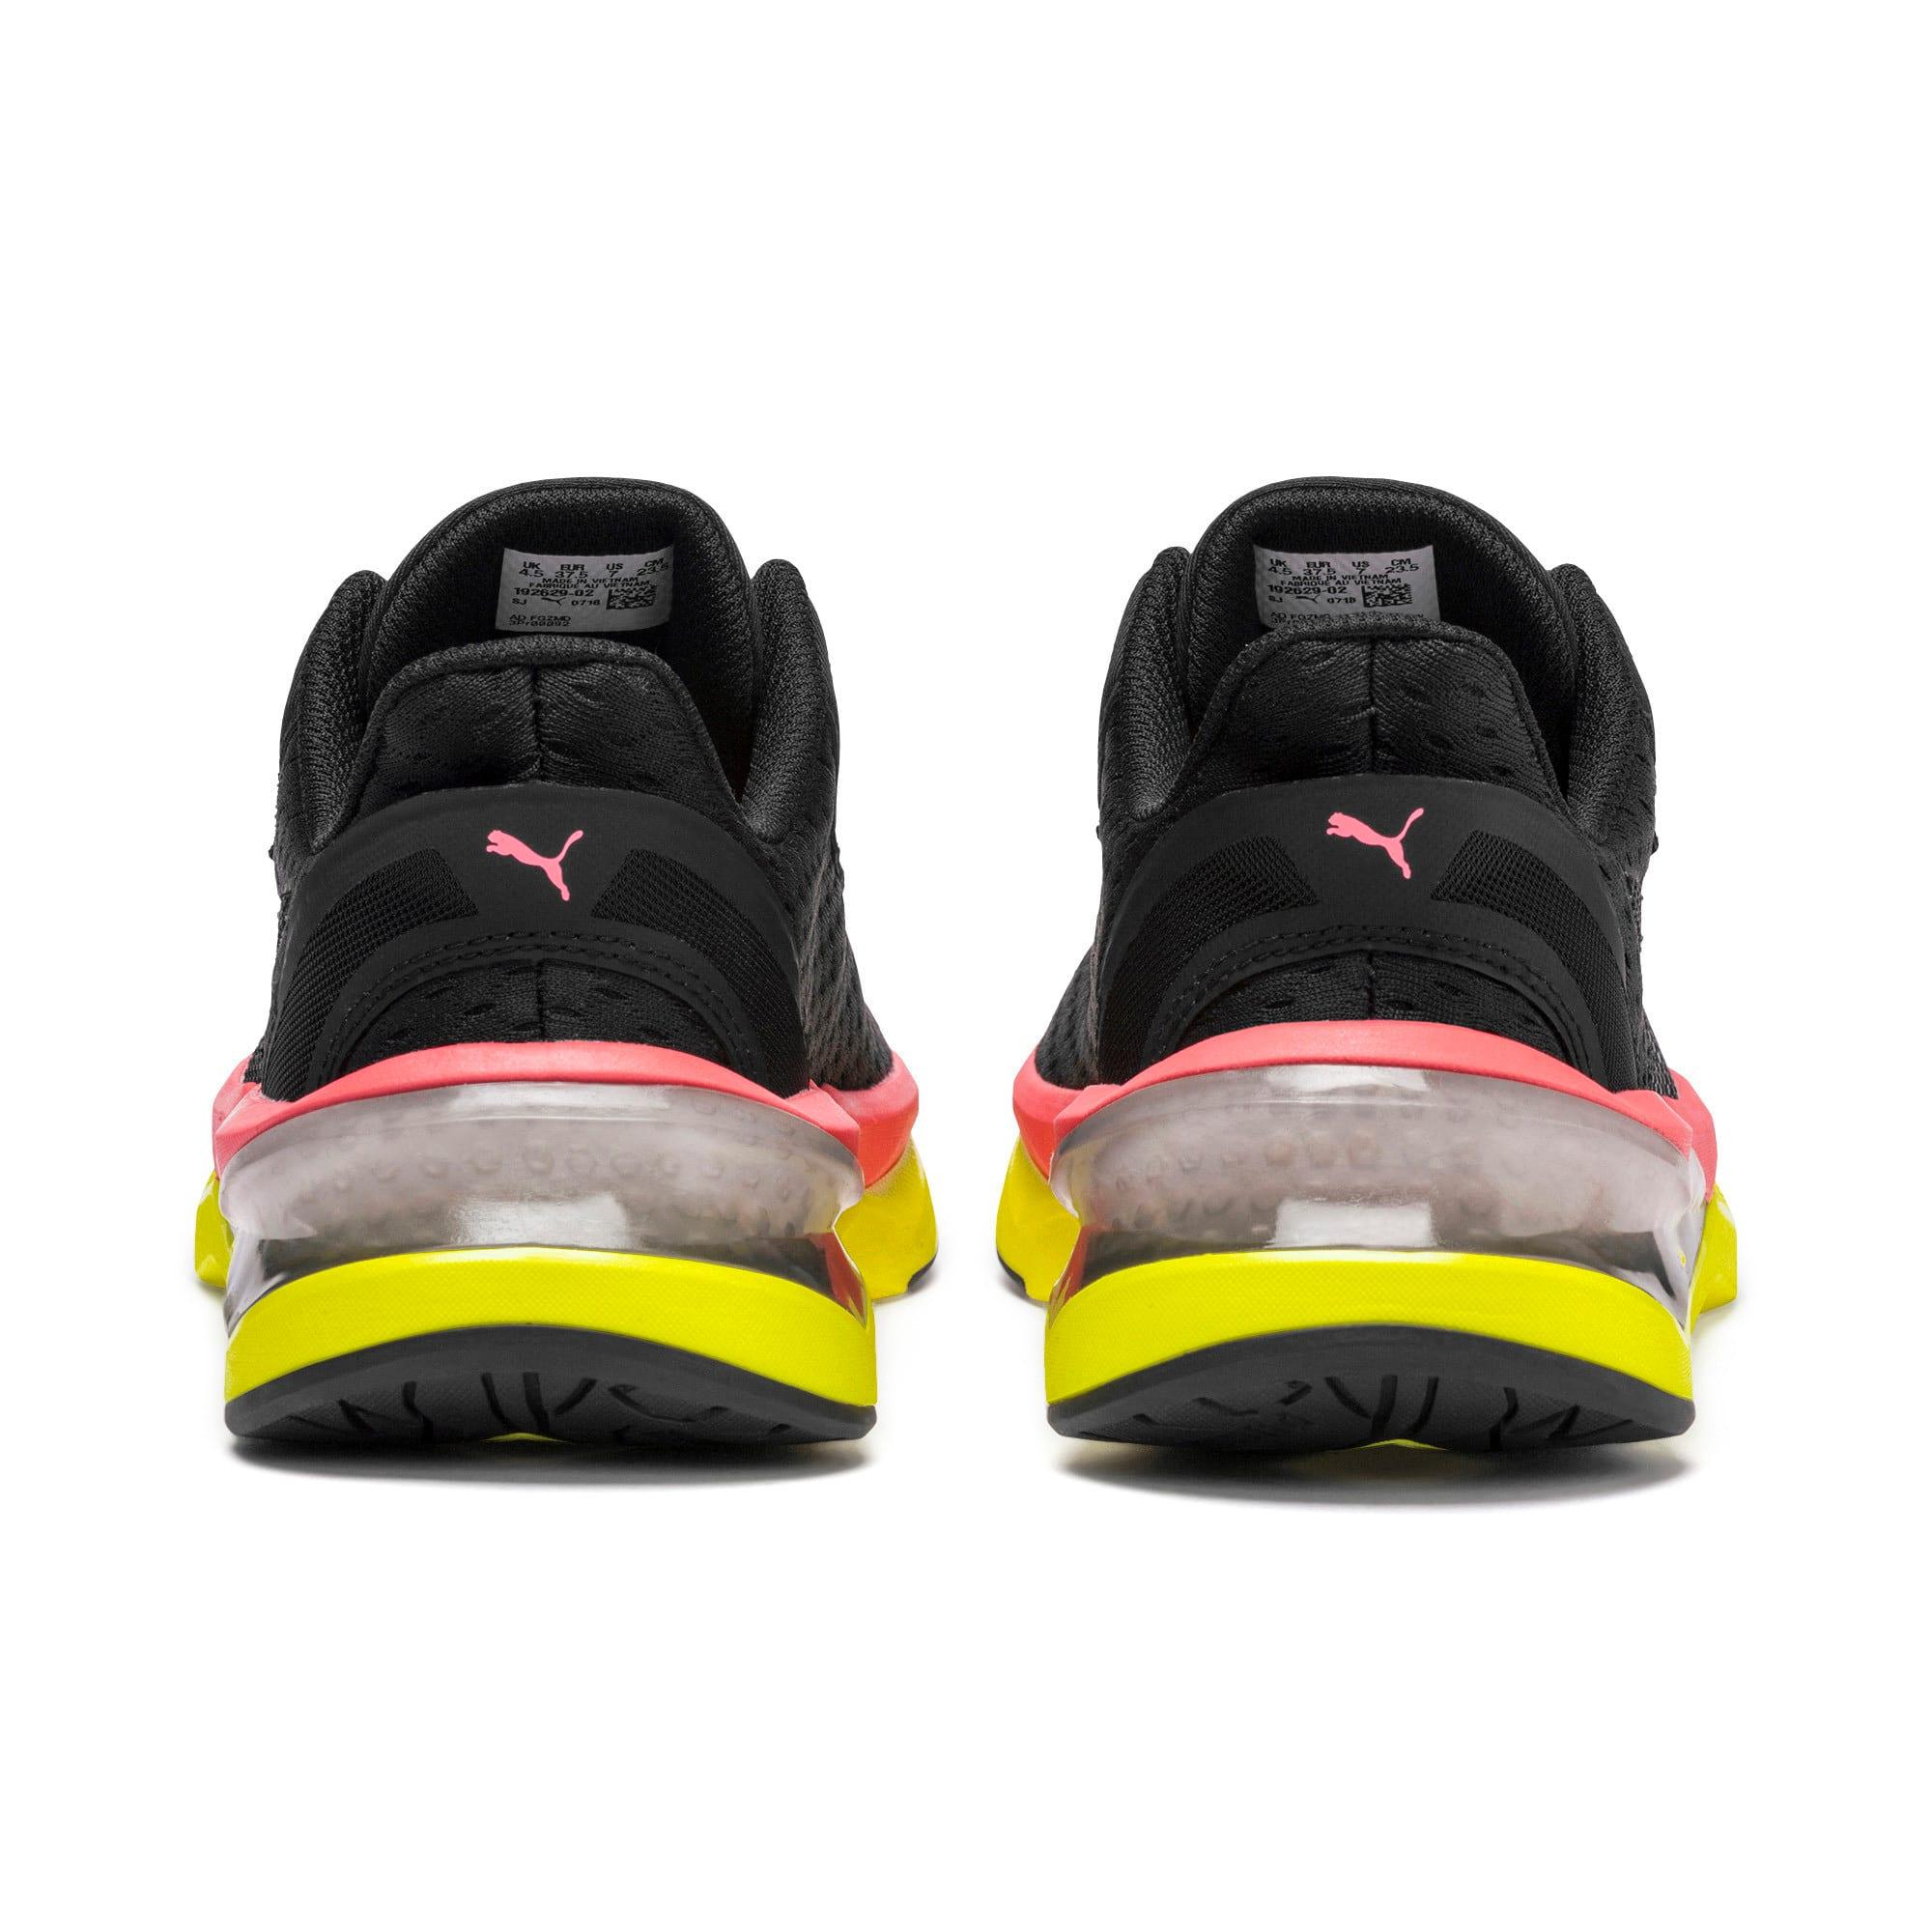 Thumbnail 4 of LQDCELL Shatter XT Women's Training Shoes, Puma Black-Yellow Alert, medium